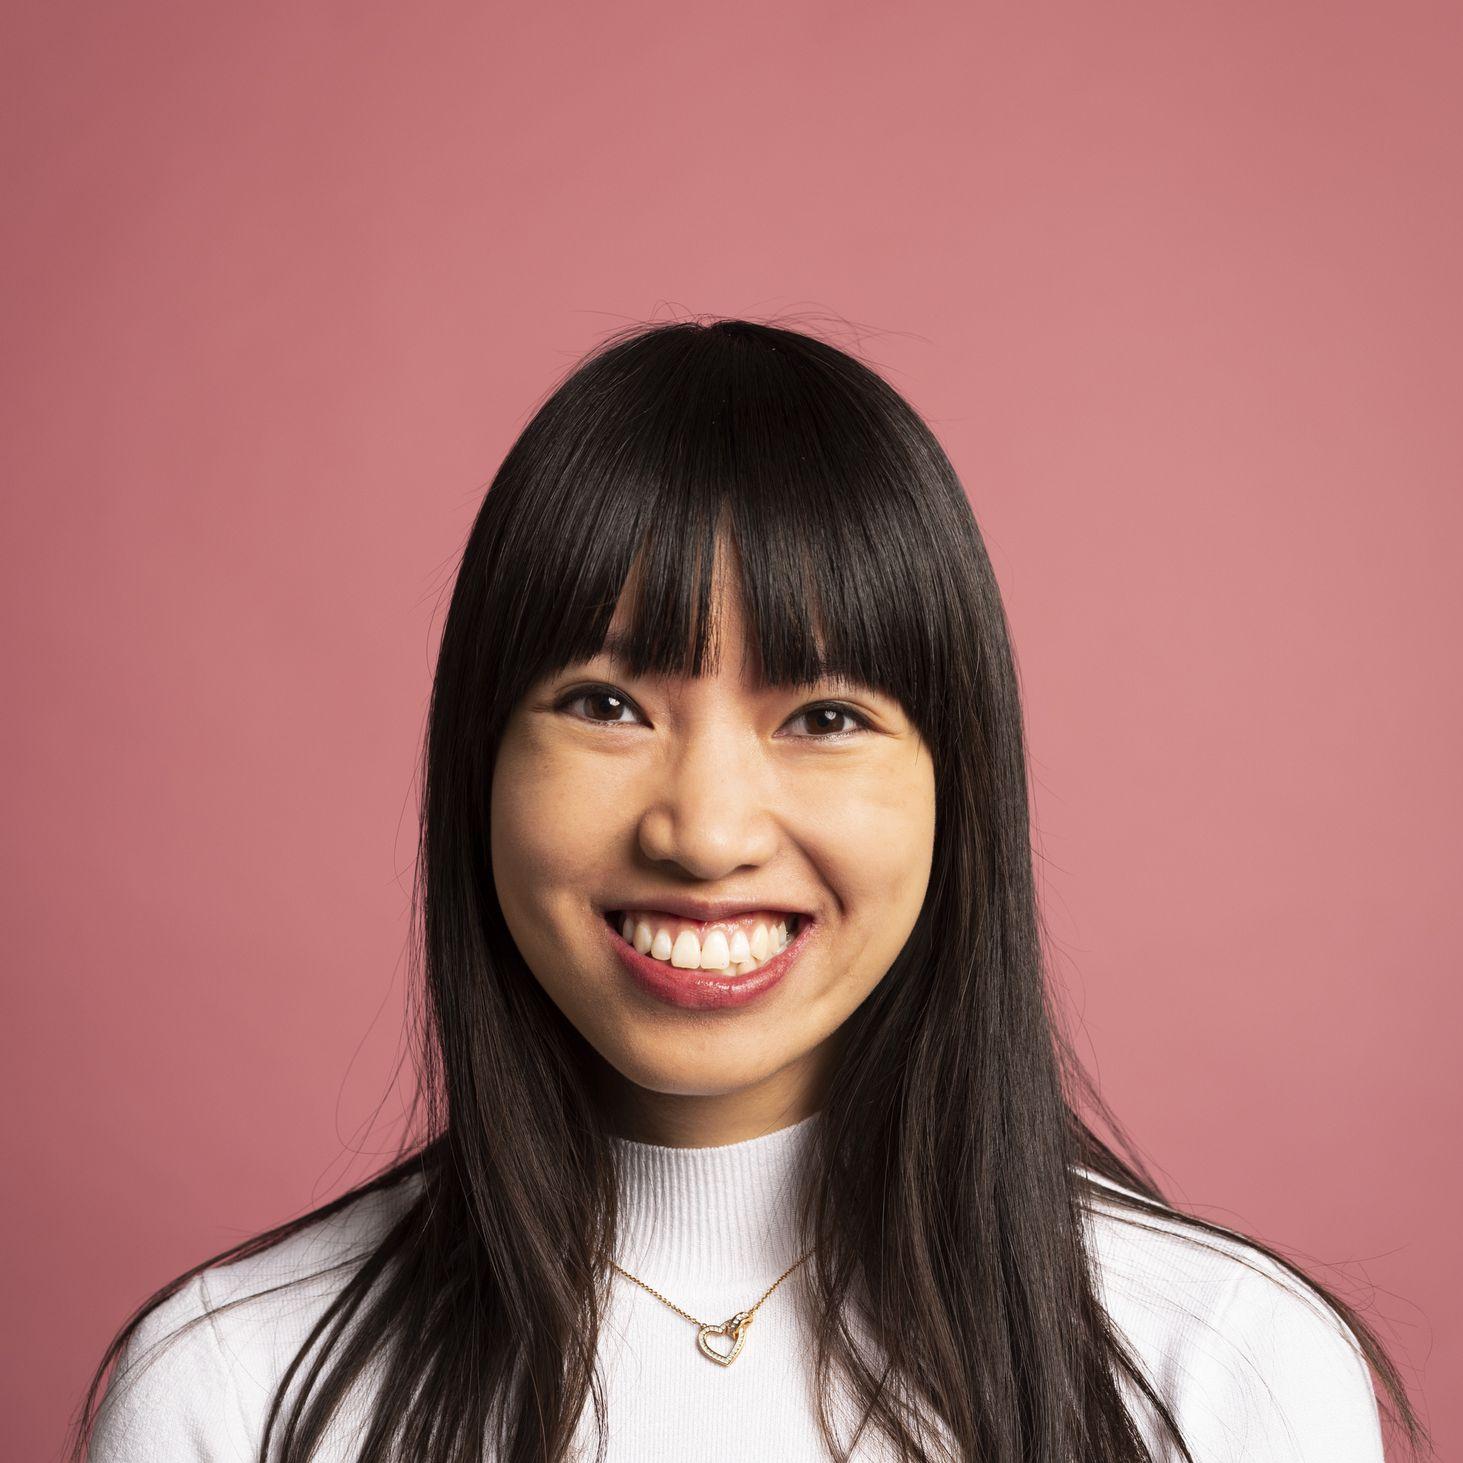 American Vs Asian Beauty Standards